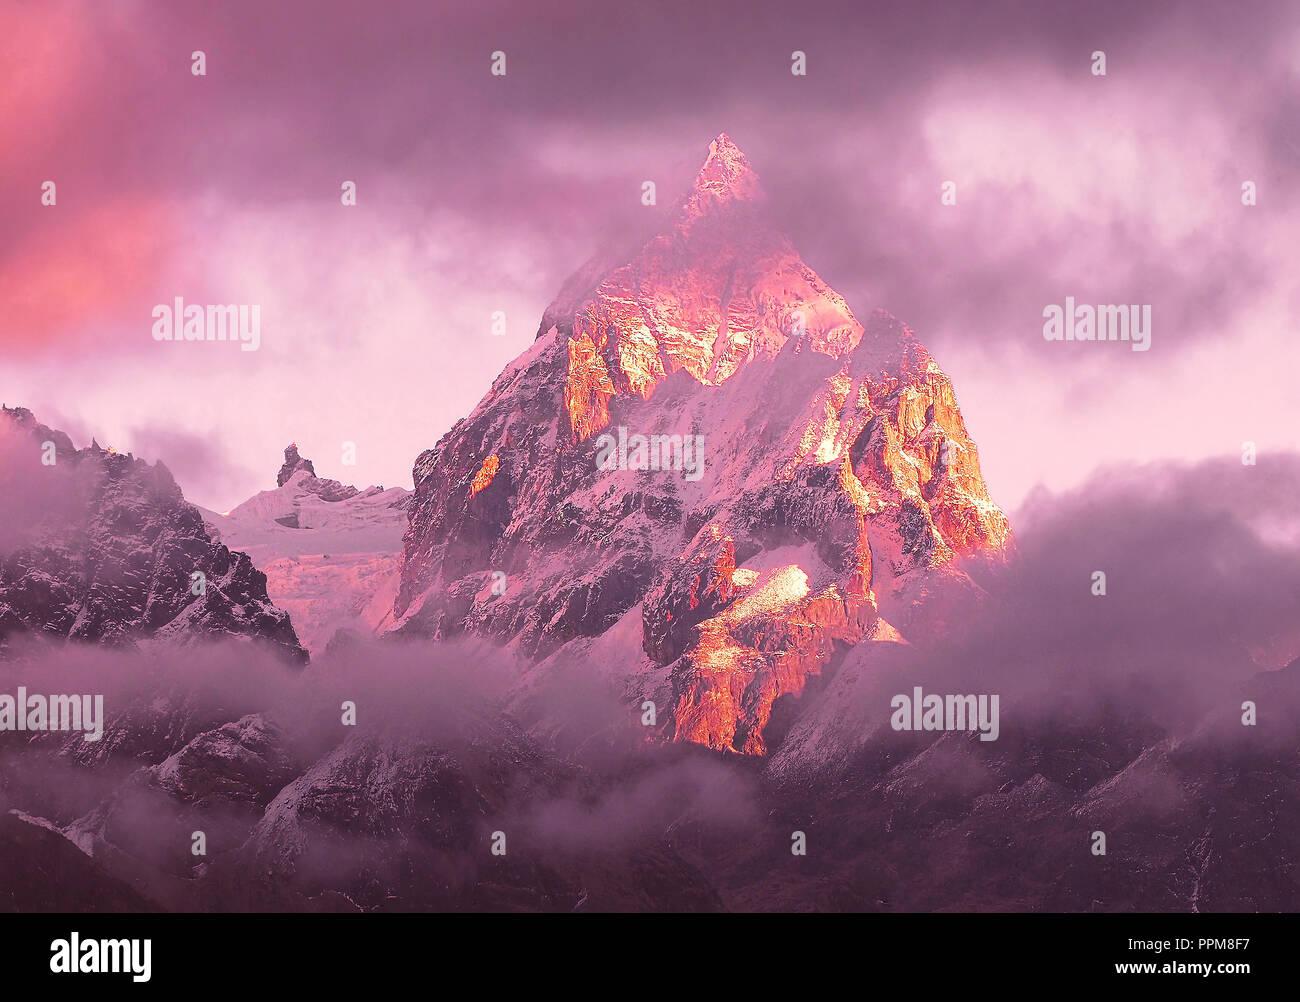 Magnificent view of Machermo peak (6,273 m) at sunset. Nepal, Himalayas. - Stock Image